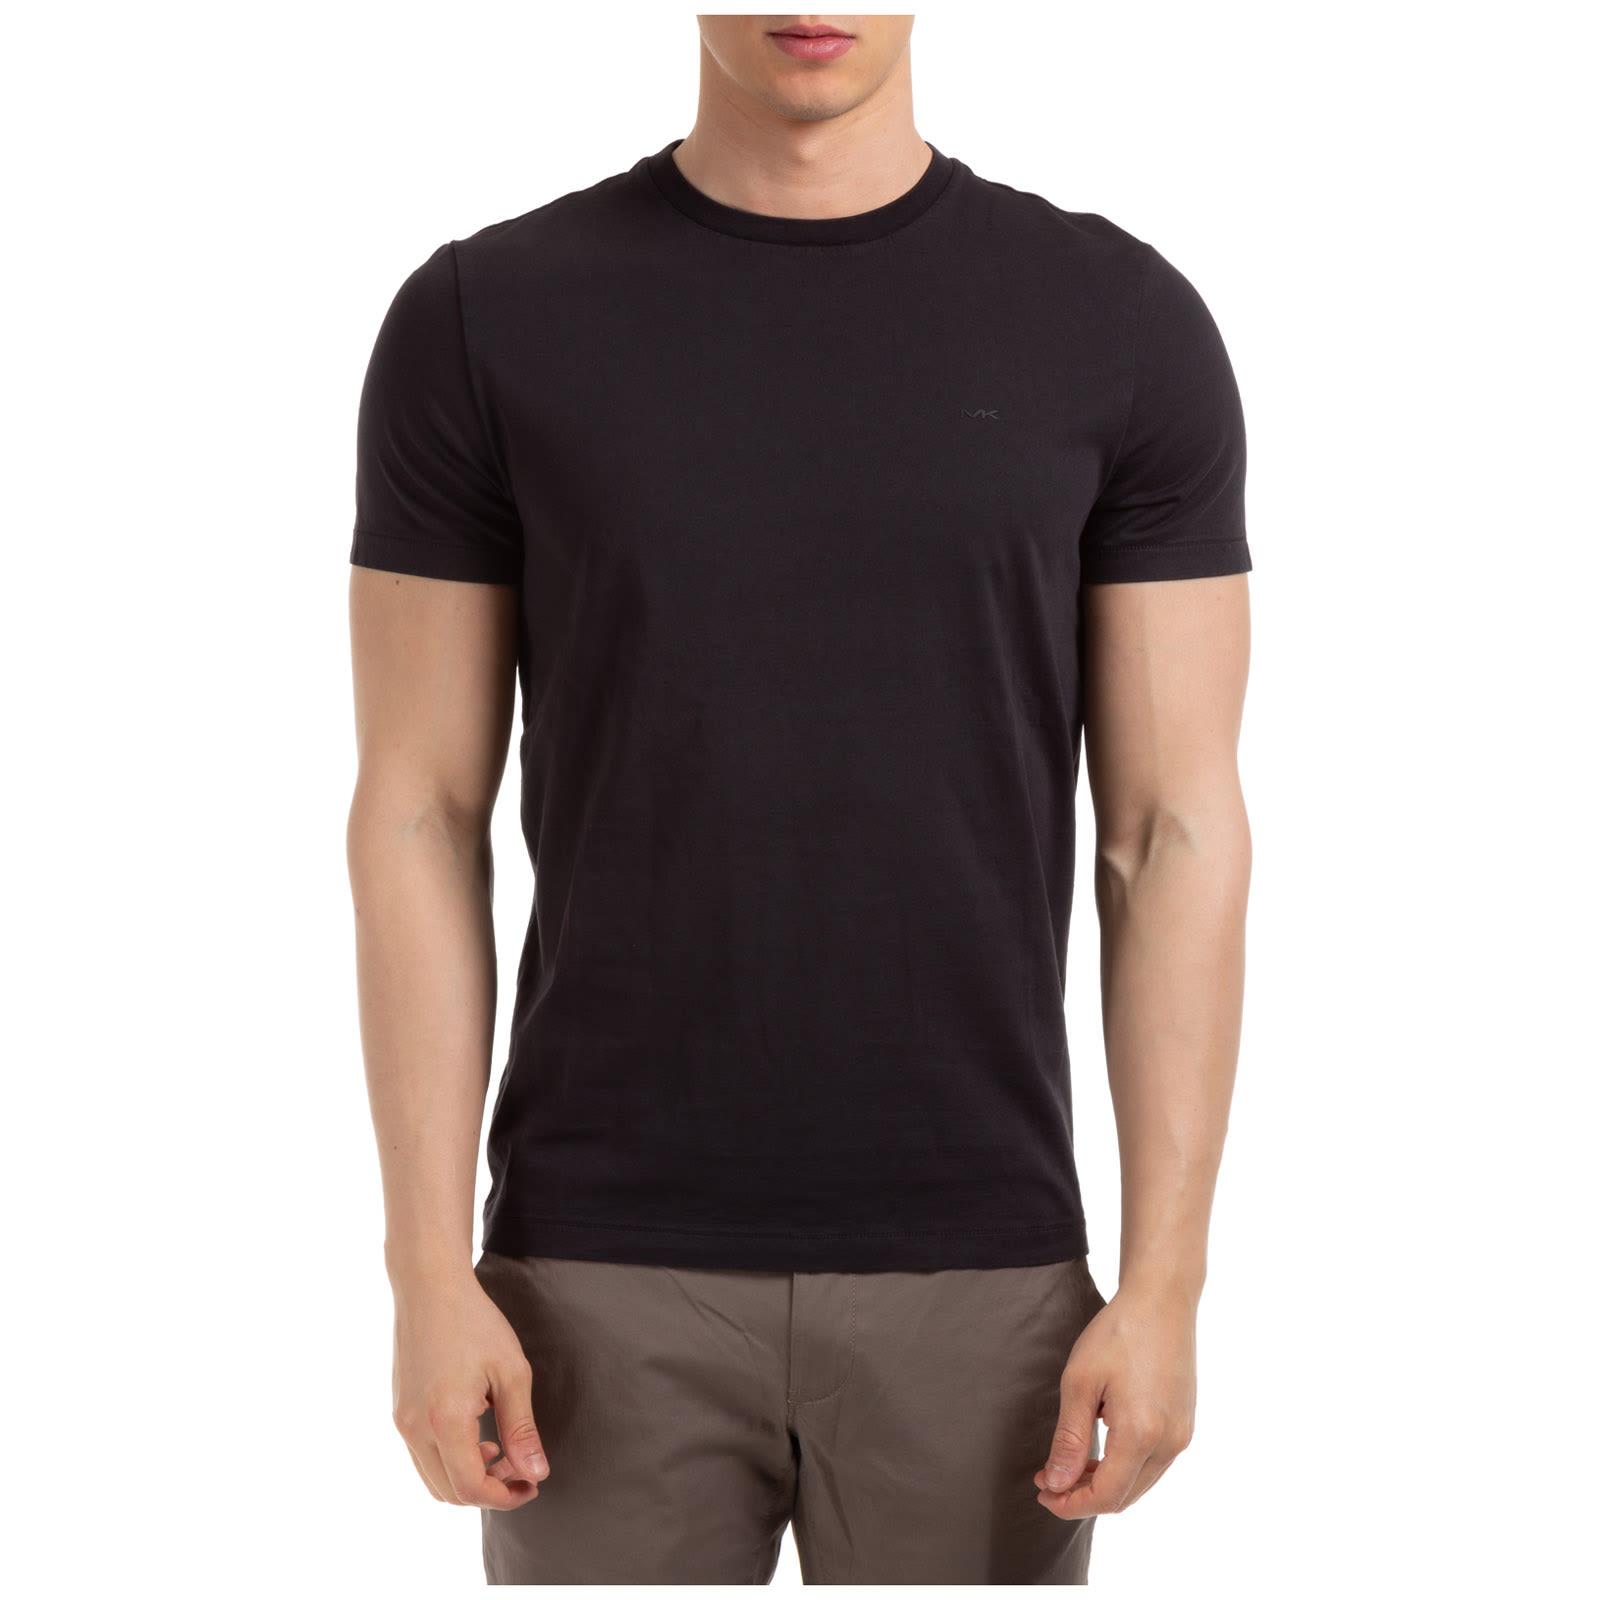 Michael Kors Nolan T-shirt